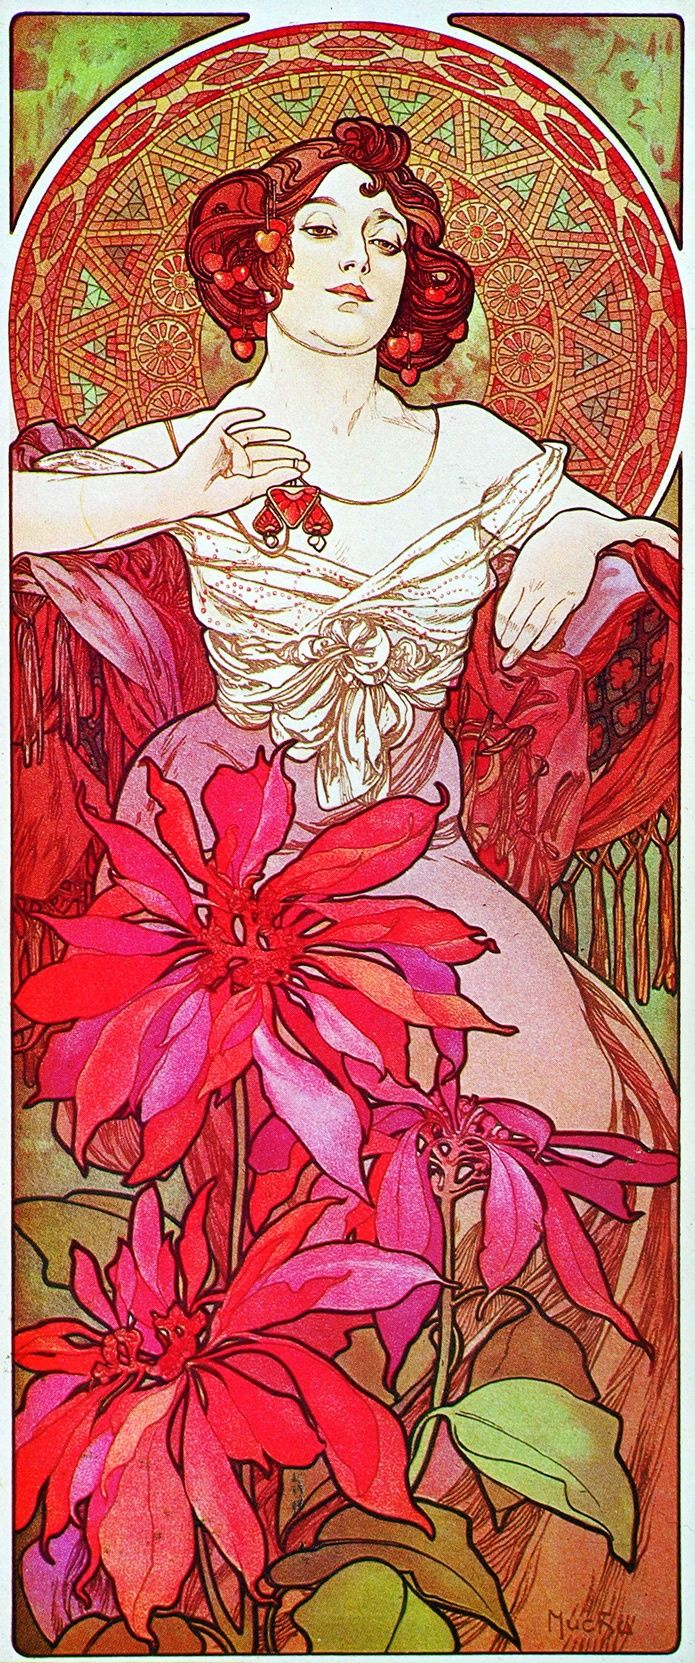 Alphonse Mucha | Le Rubis (1900): Alfons Mucha, Alphon Lot, Crosses Stitches Patterns, Precious Stones, Art Nouveau, Artnouveau, Alphonsemucha, Art Deco, Alphonse Mucha